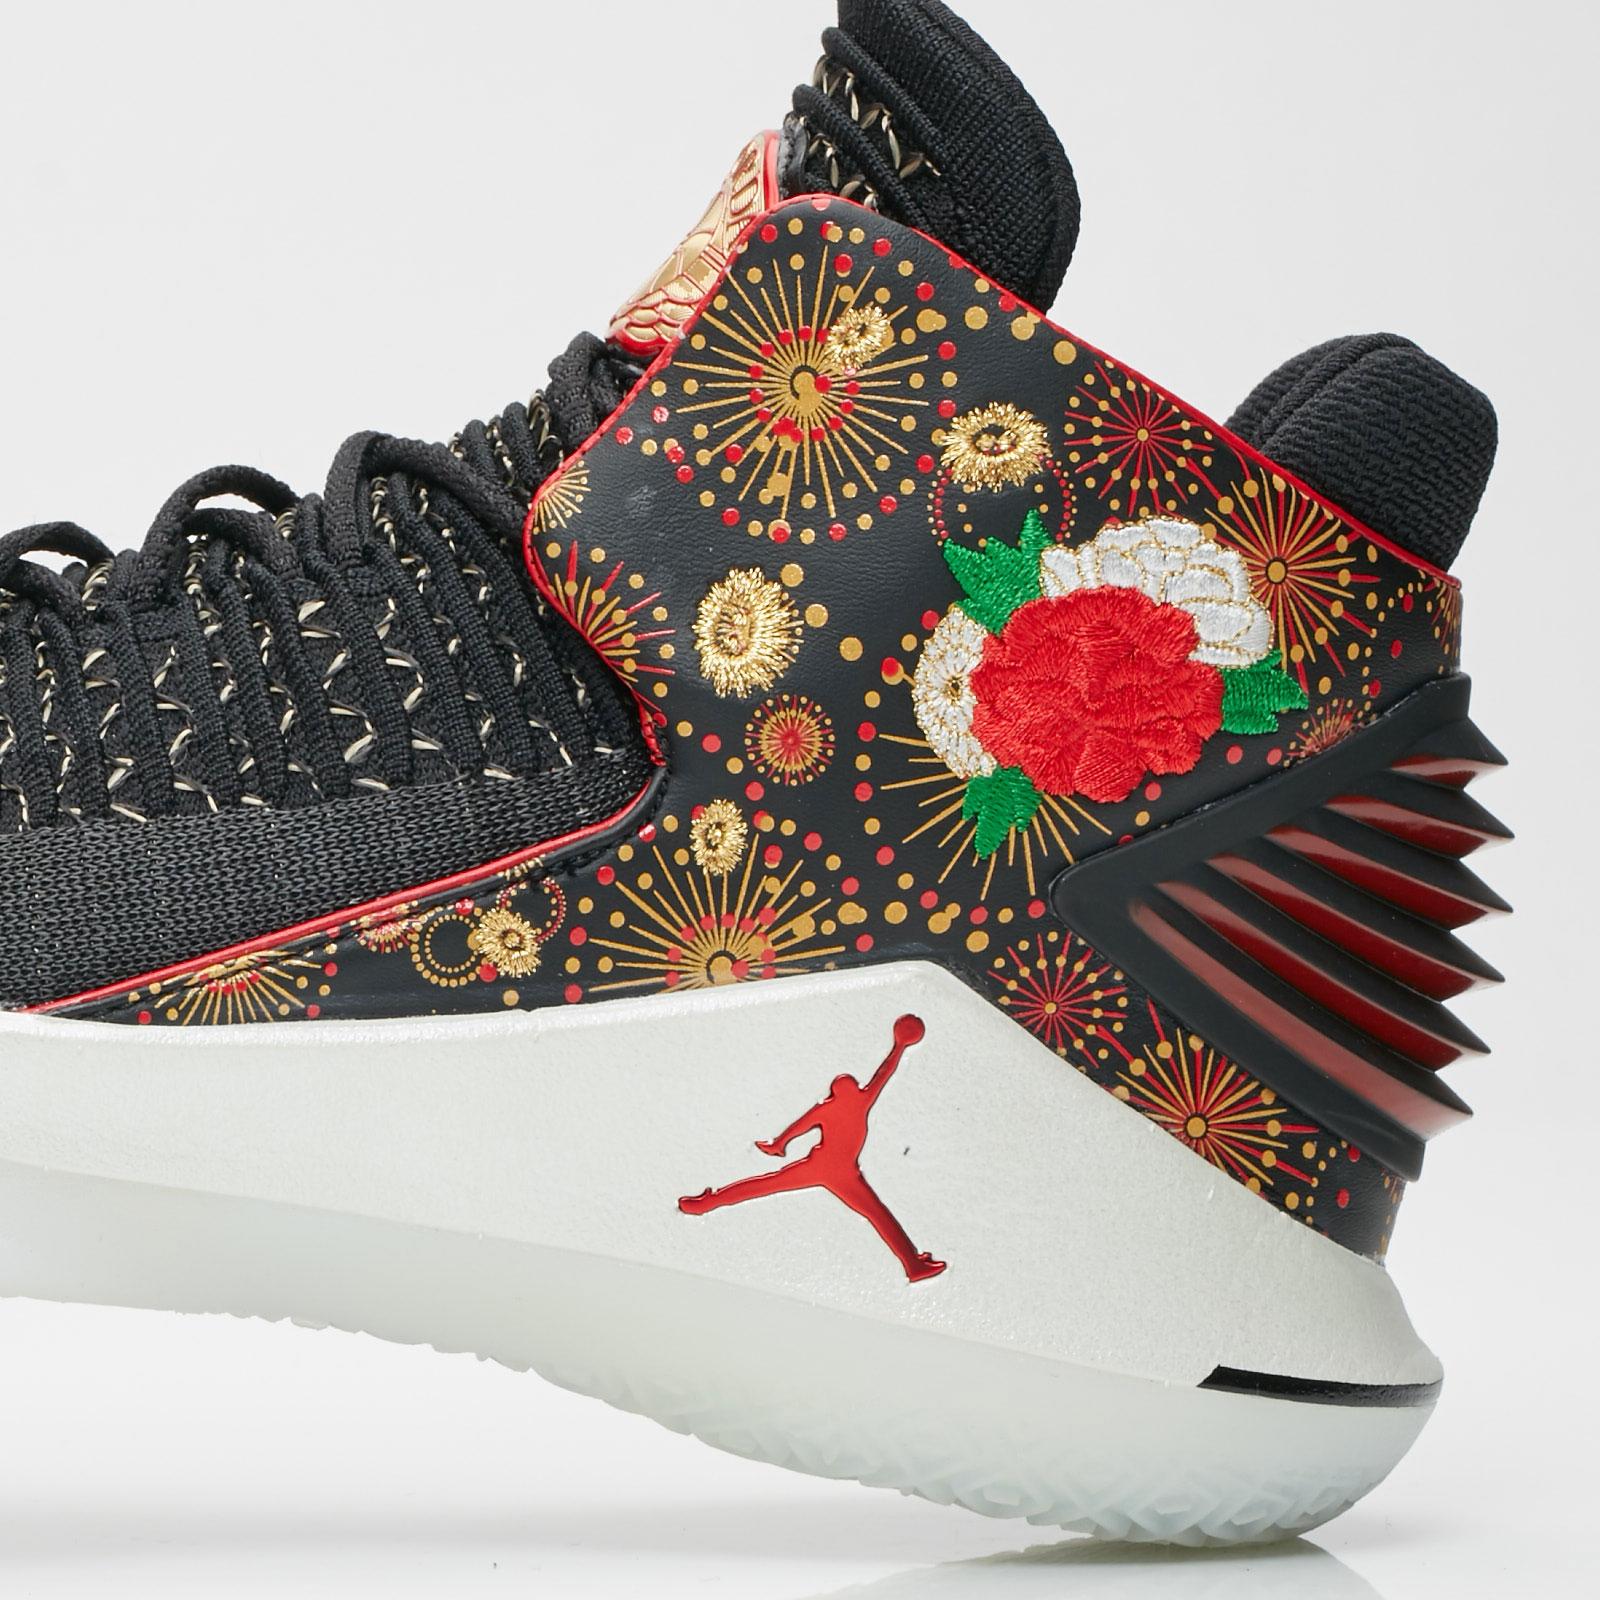 92b69bf9849 Jordan Brand Air Jordan XXXII CNY - Aj6331-042 - Sneakersnstuff ...